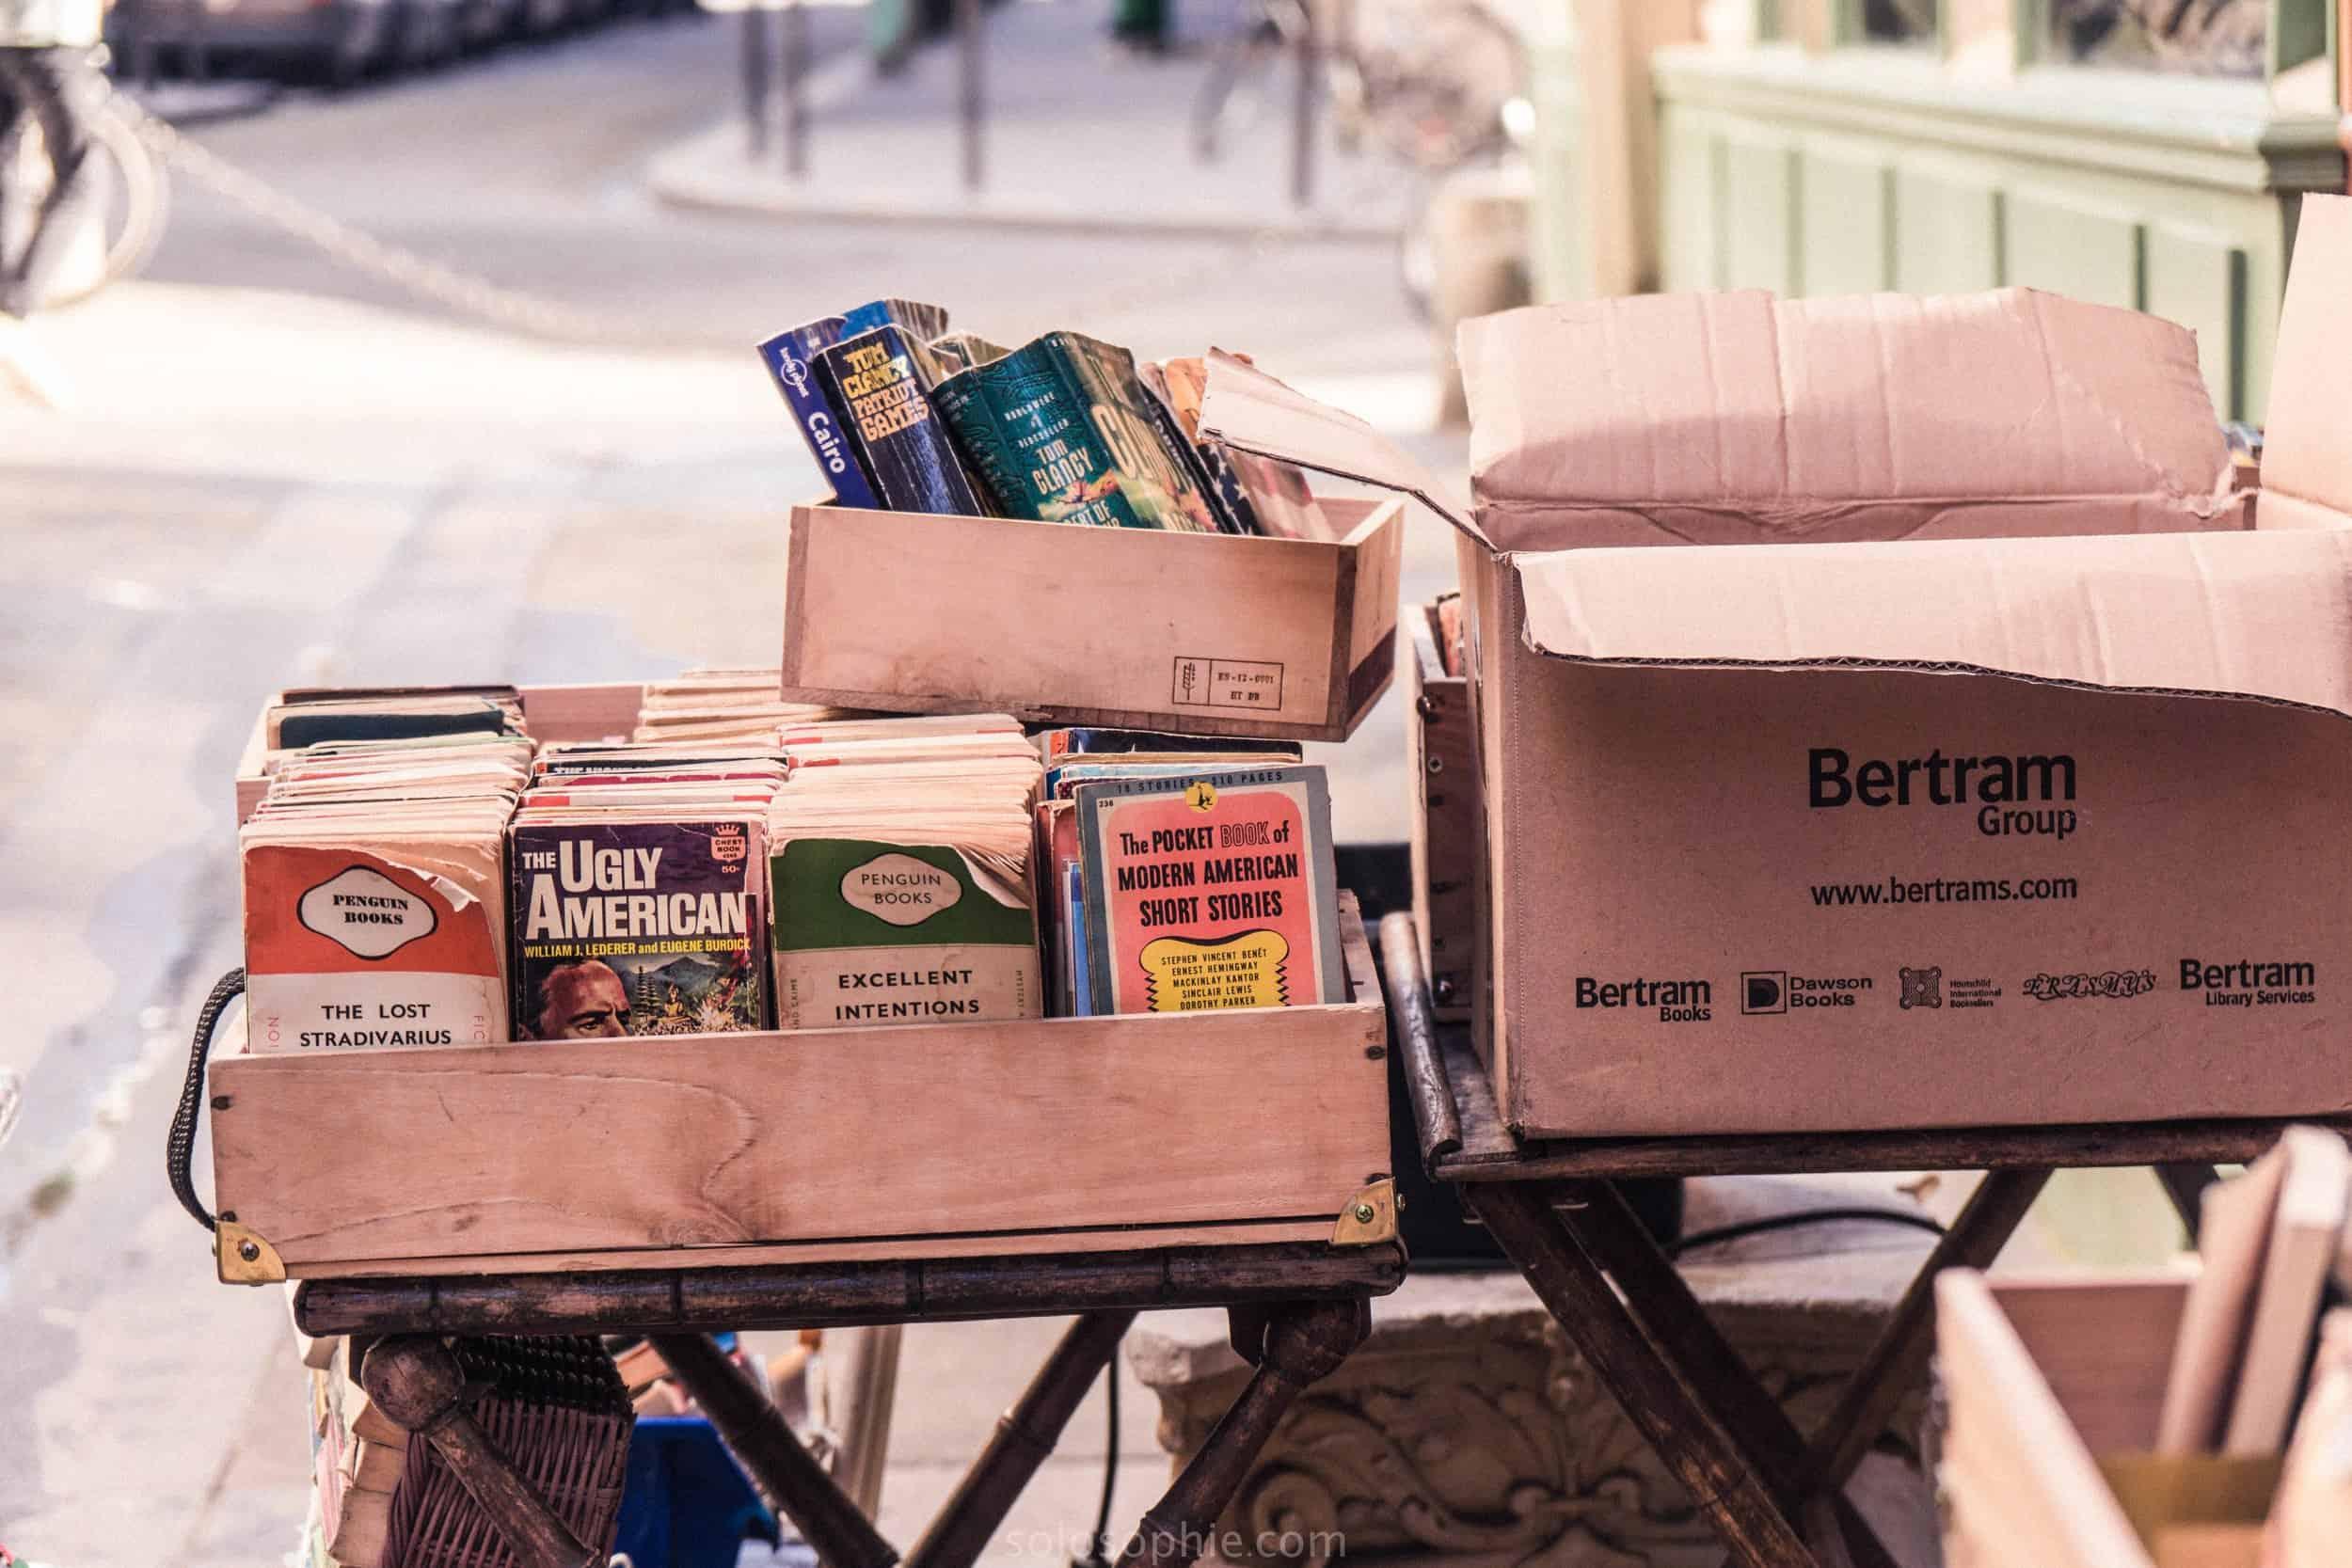 The Abbey Bookshop, Latin Quarter, Paris, France: boxes of books